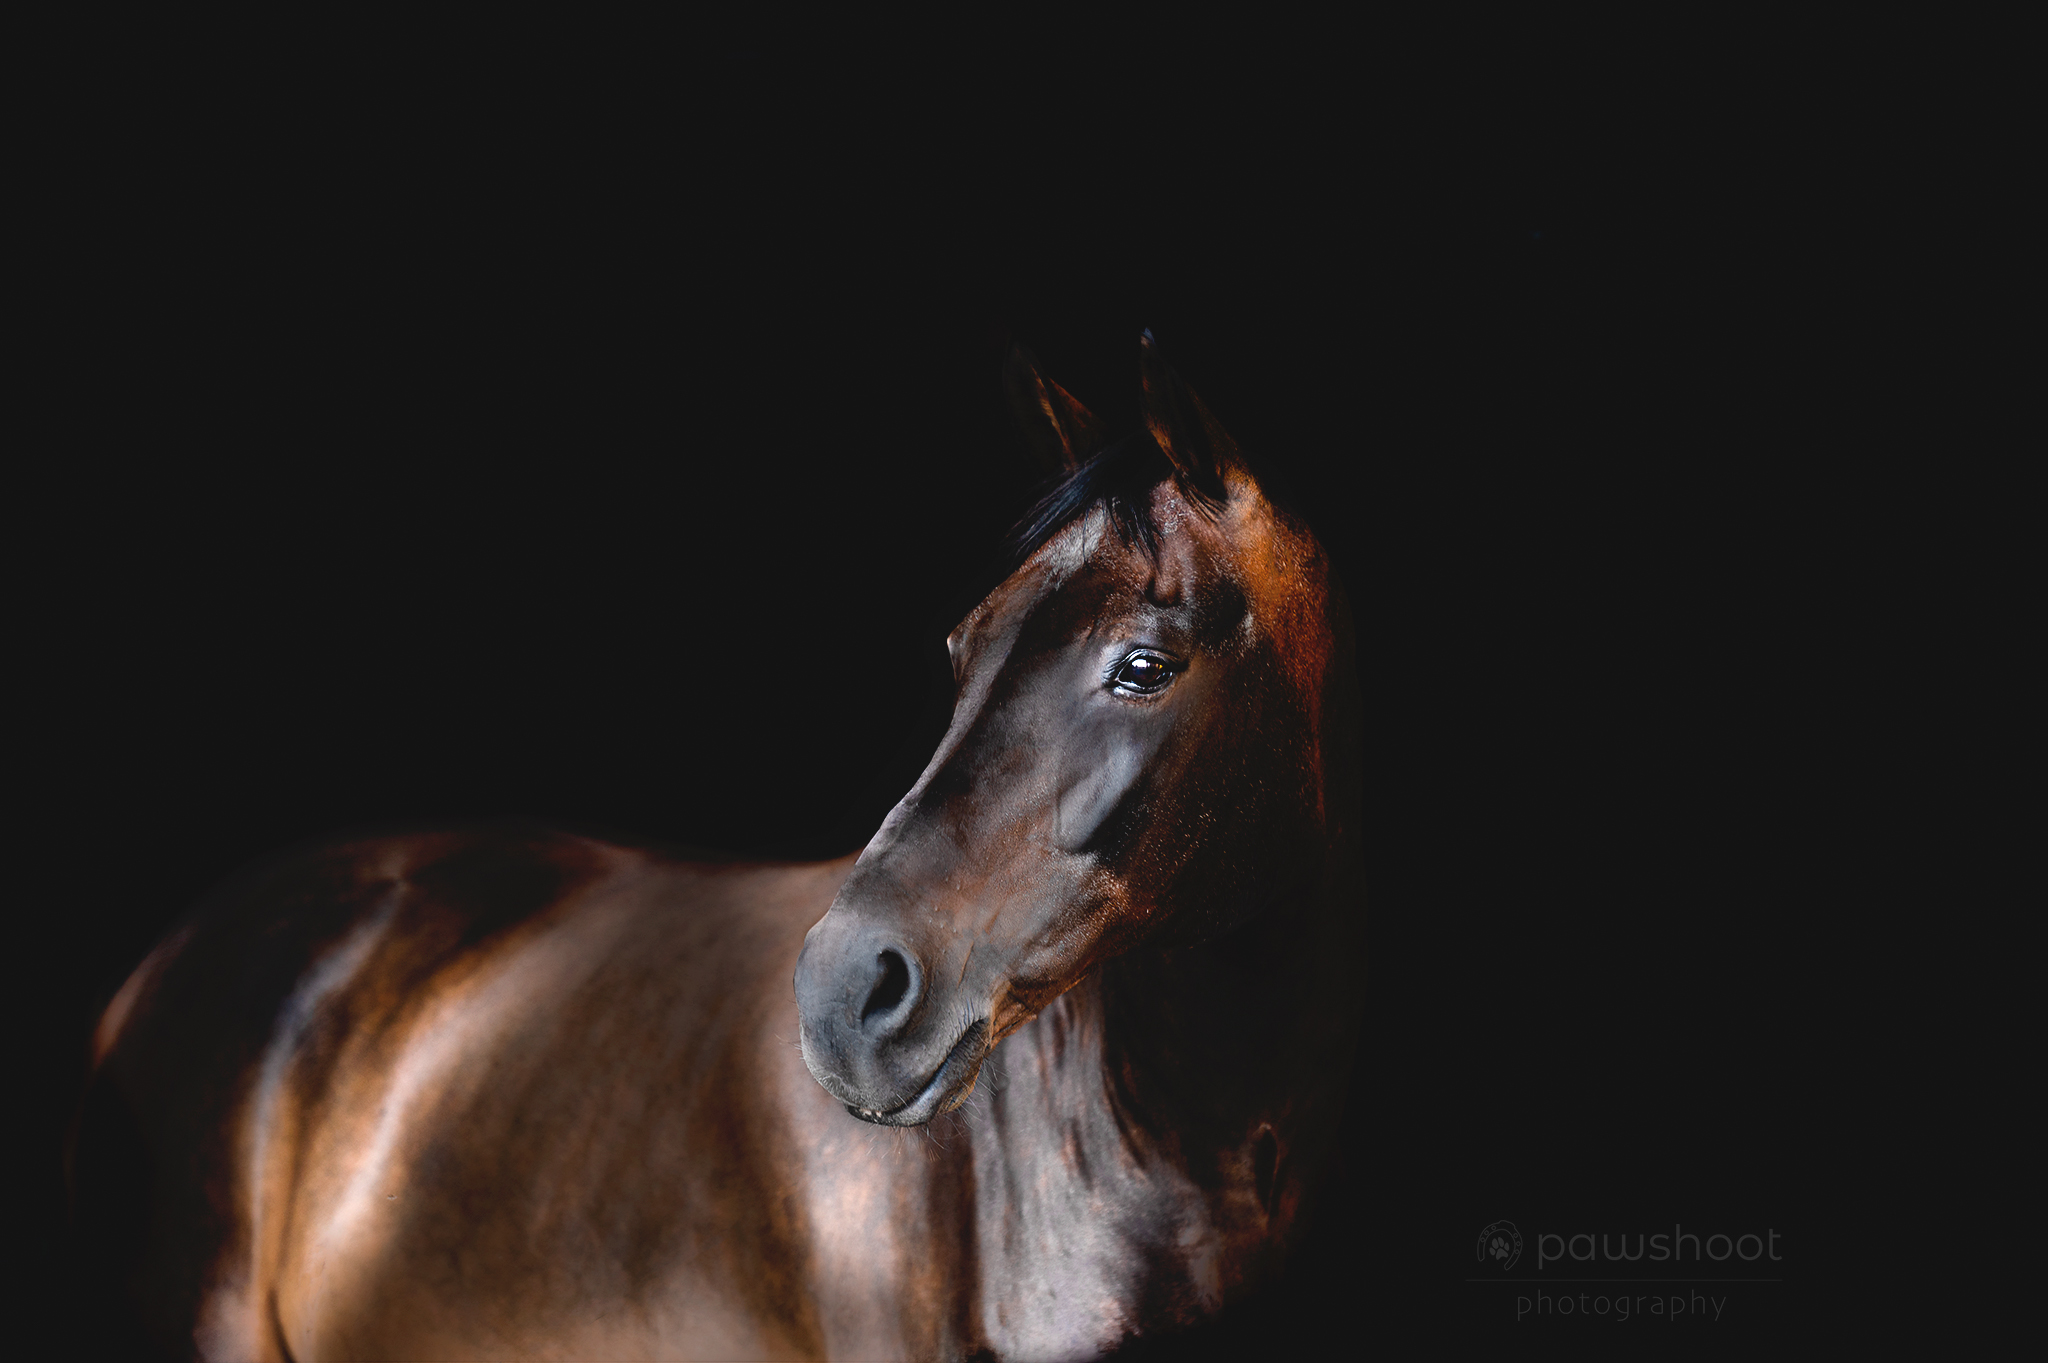 Matte black shoot paard Pawshoot hondenfotografie